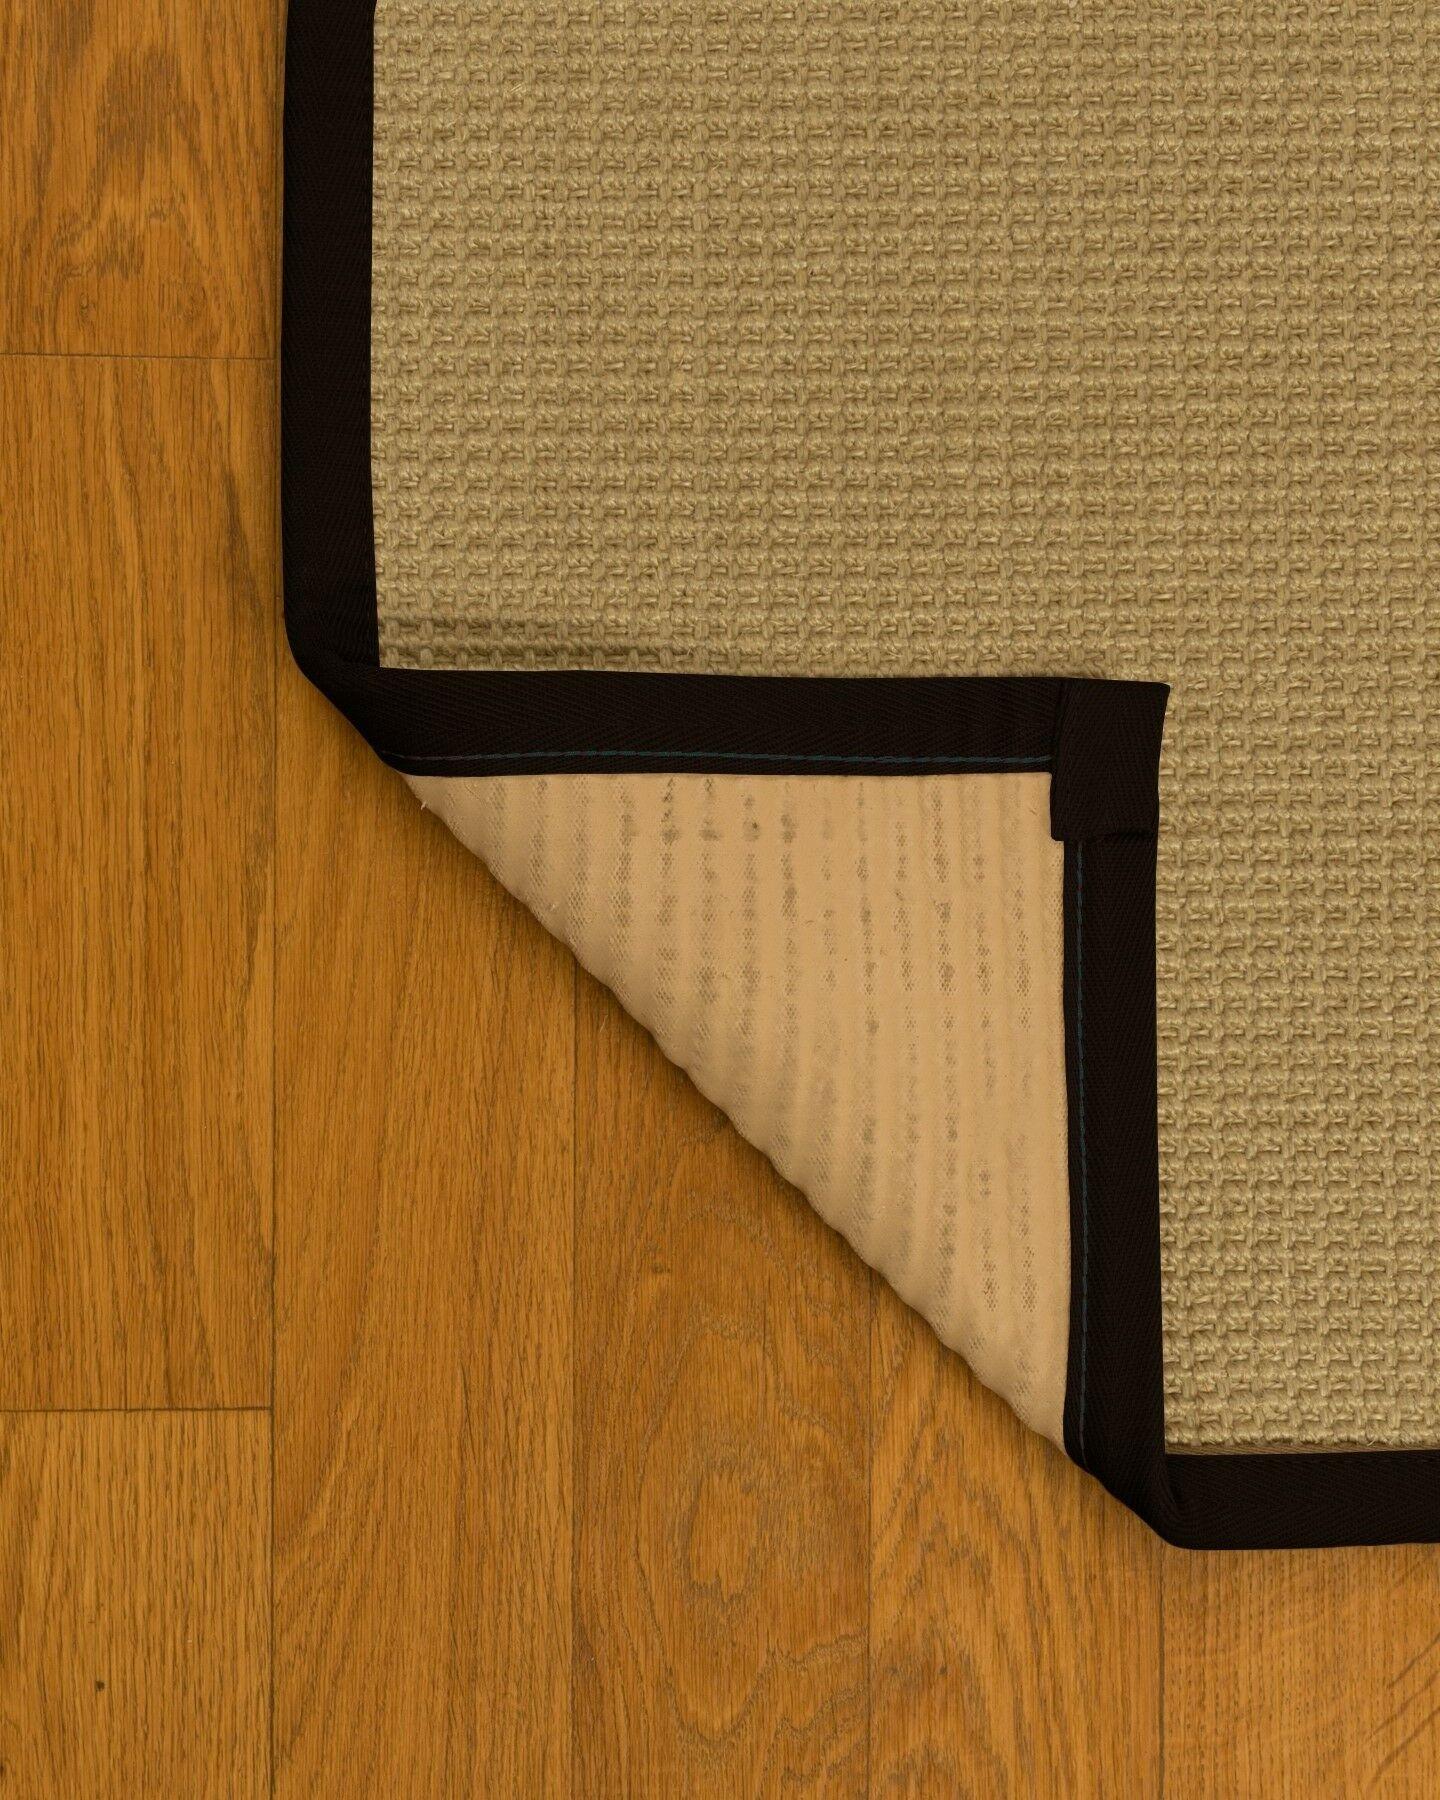 Jacobs Natural Fiber Sisal Hand-Woven Beige Area Rug Rug Size: Rectangle 5' x 8'